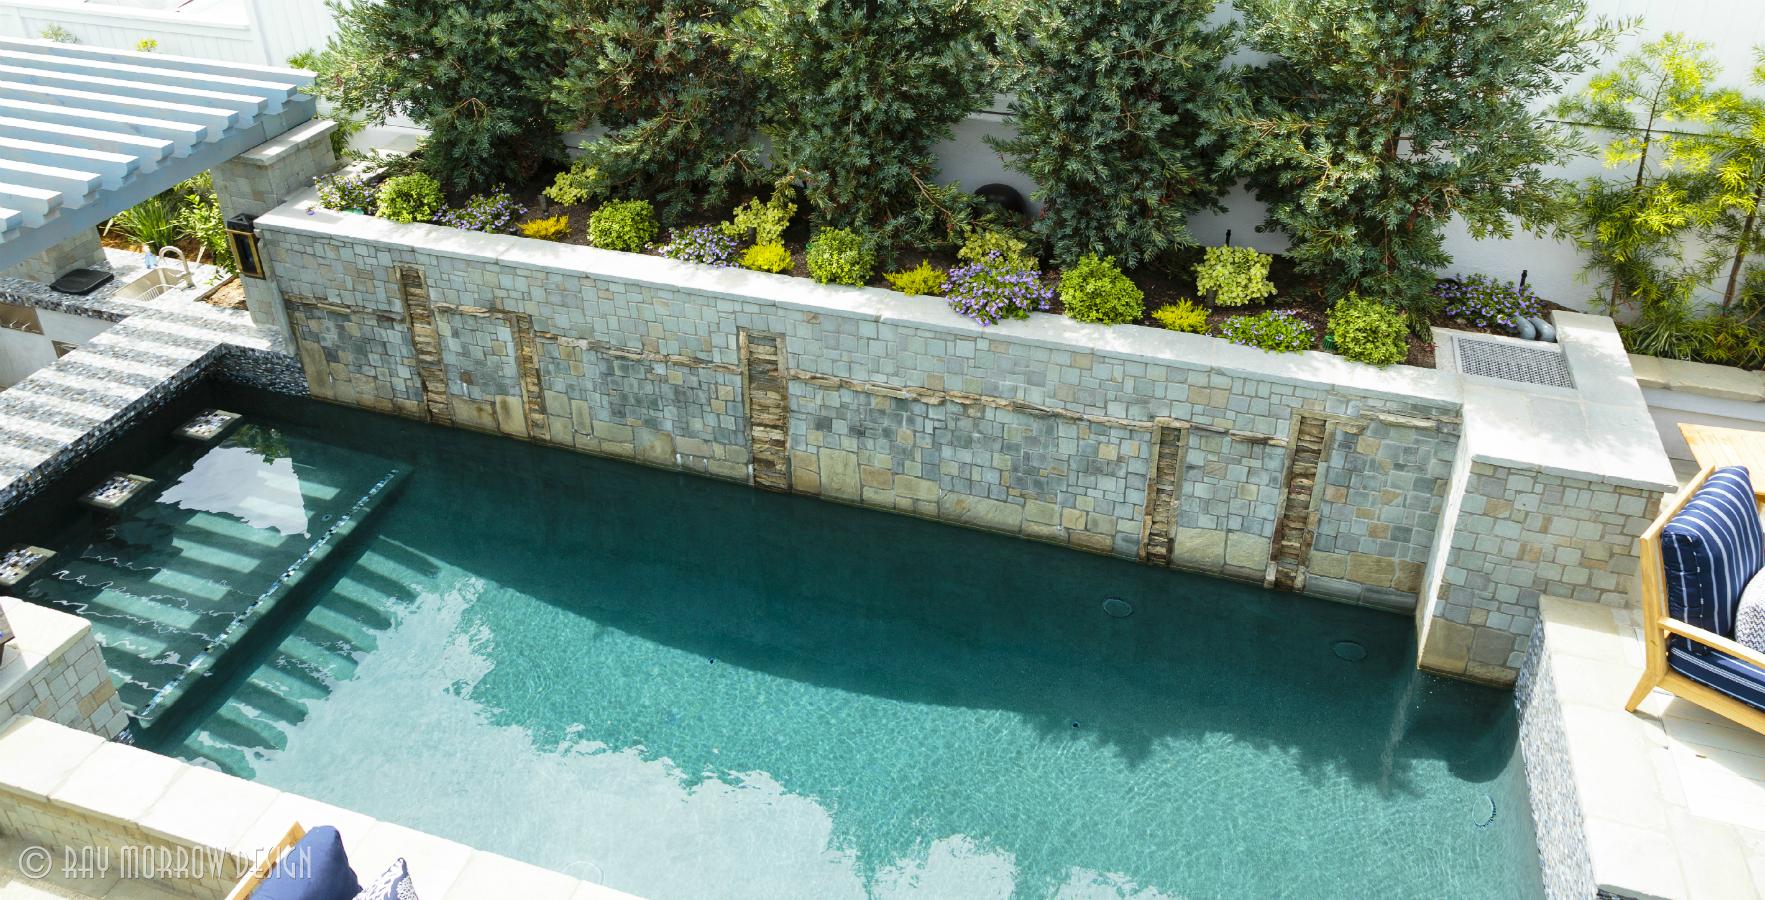 pool-with-swimup-bar-fountain-wall-cottle.jpg